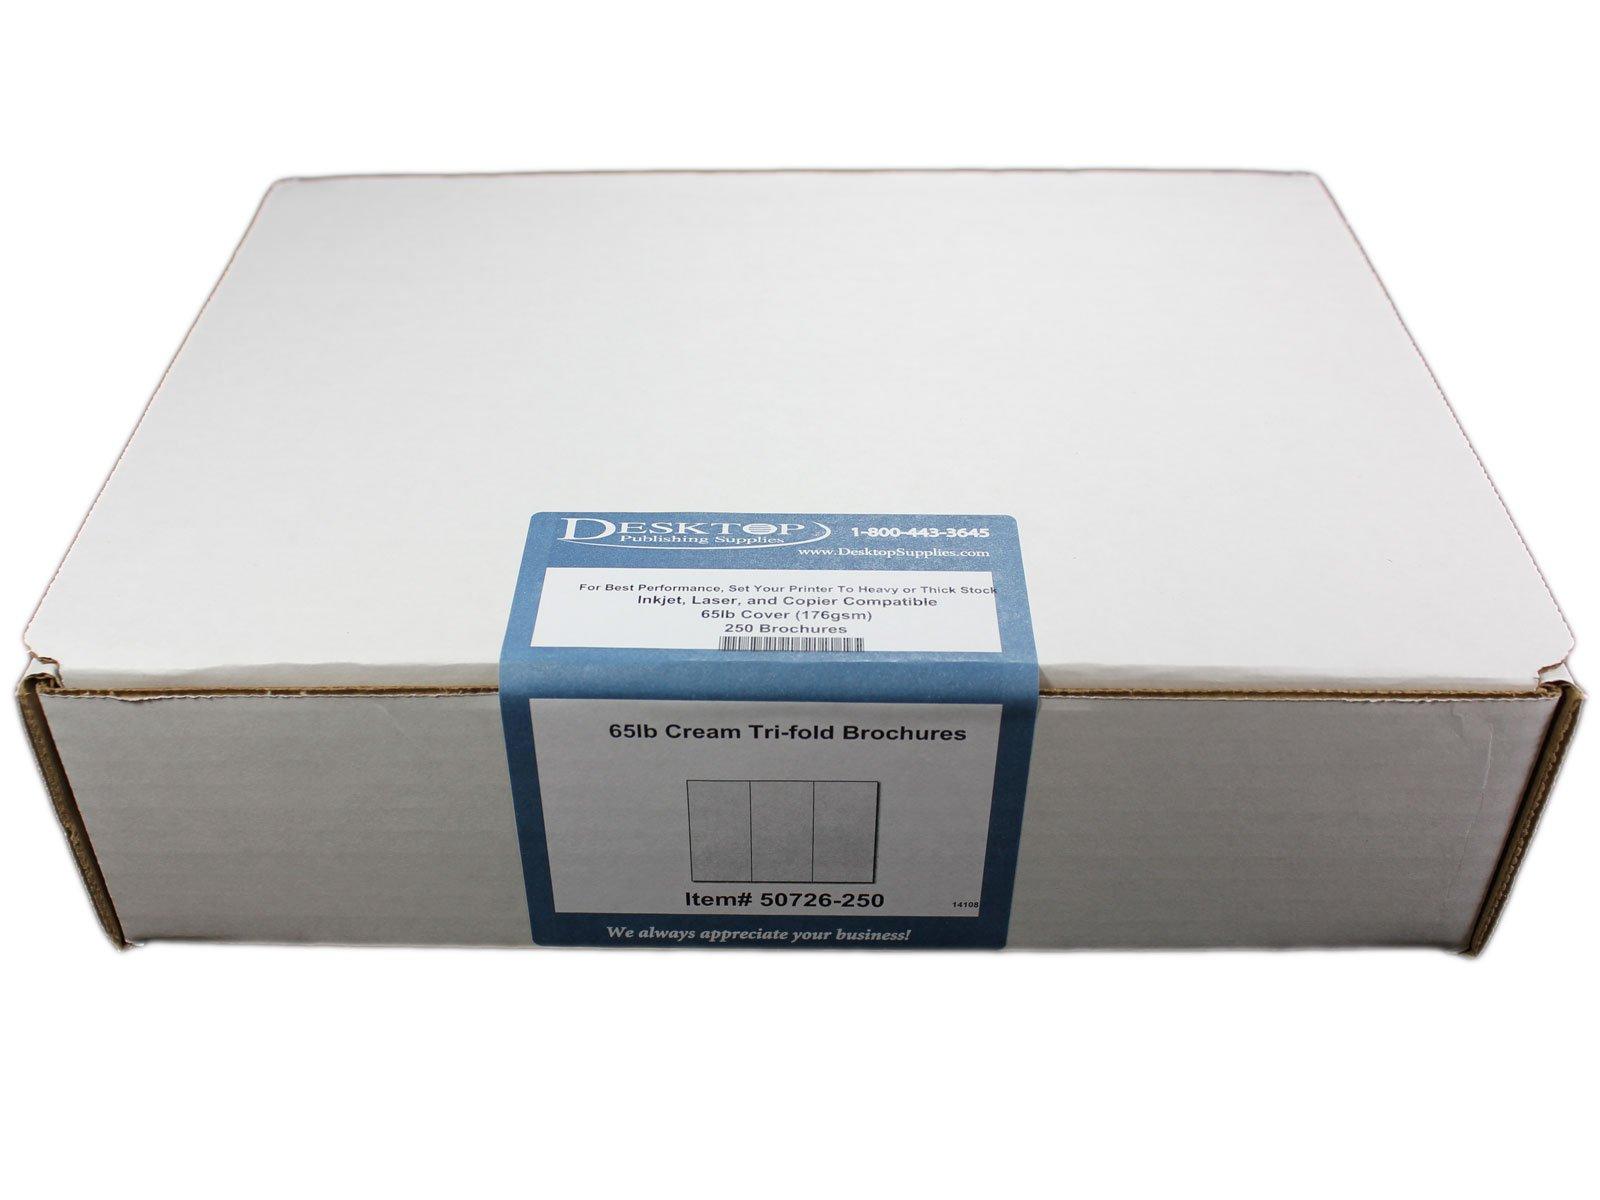 65lb Off White/Cream Tri-fold Brochures - 250 Brochures - Desktop Publishing Supplies, Inc.™ Brand